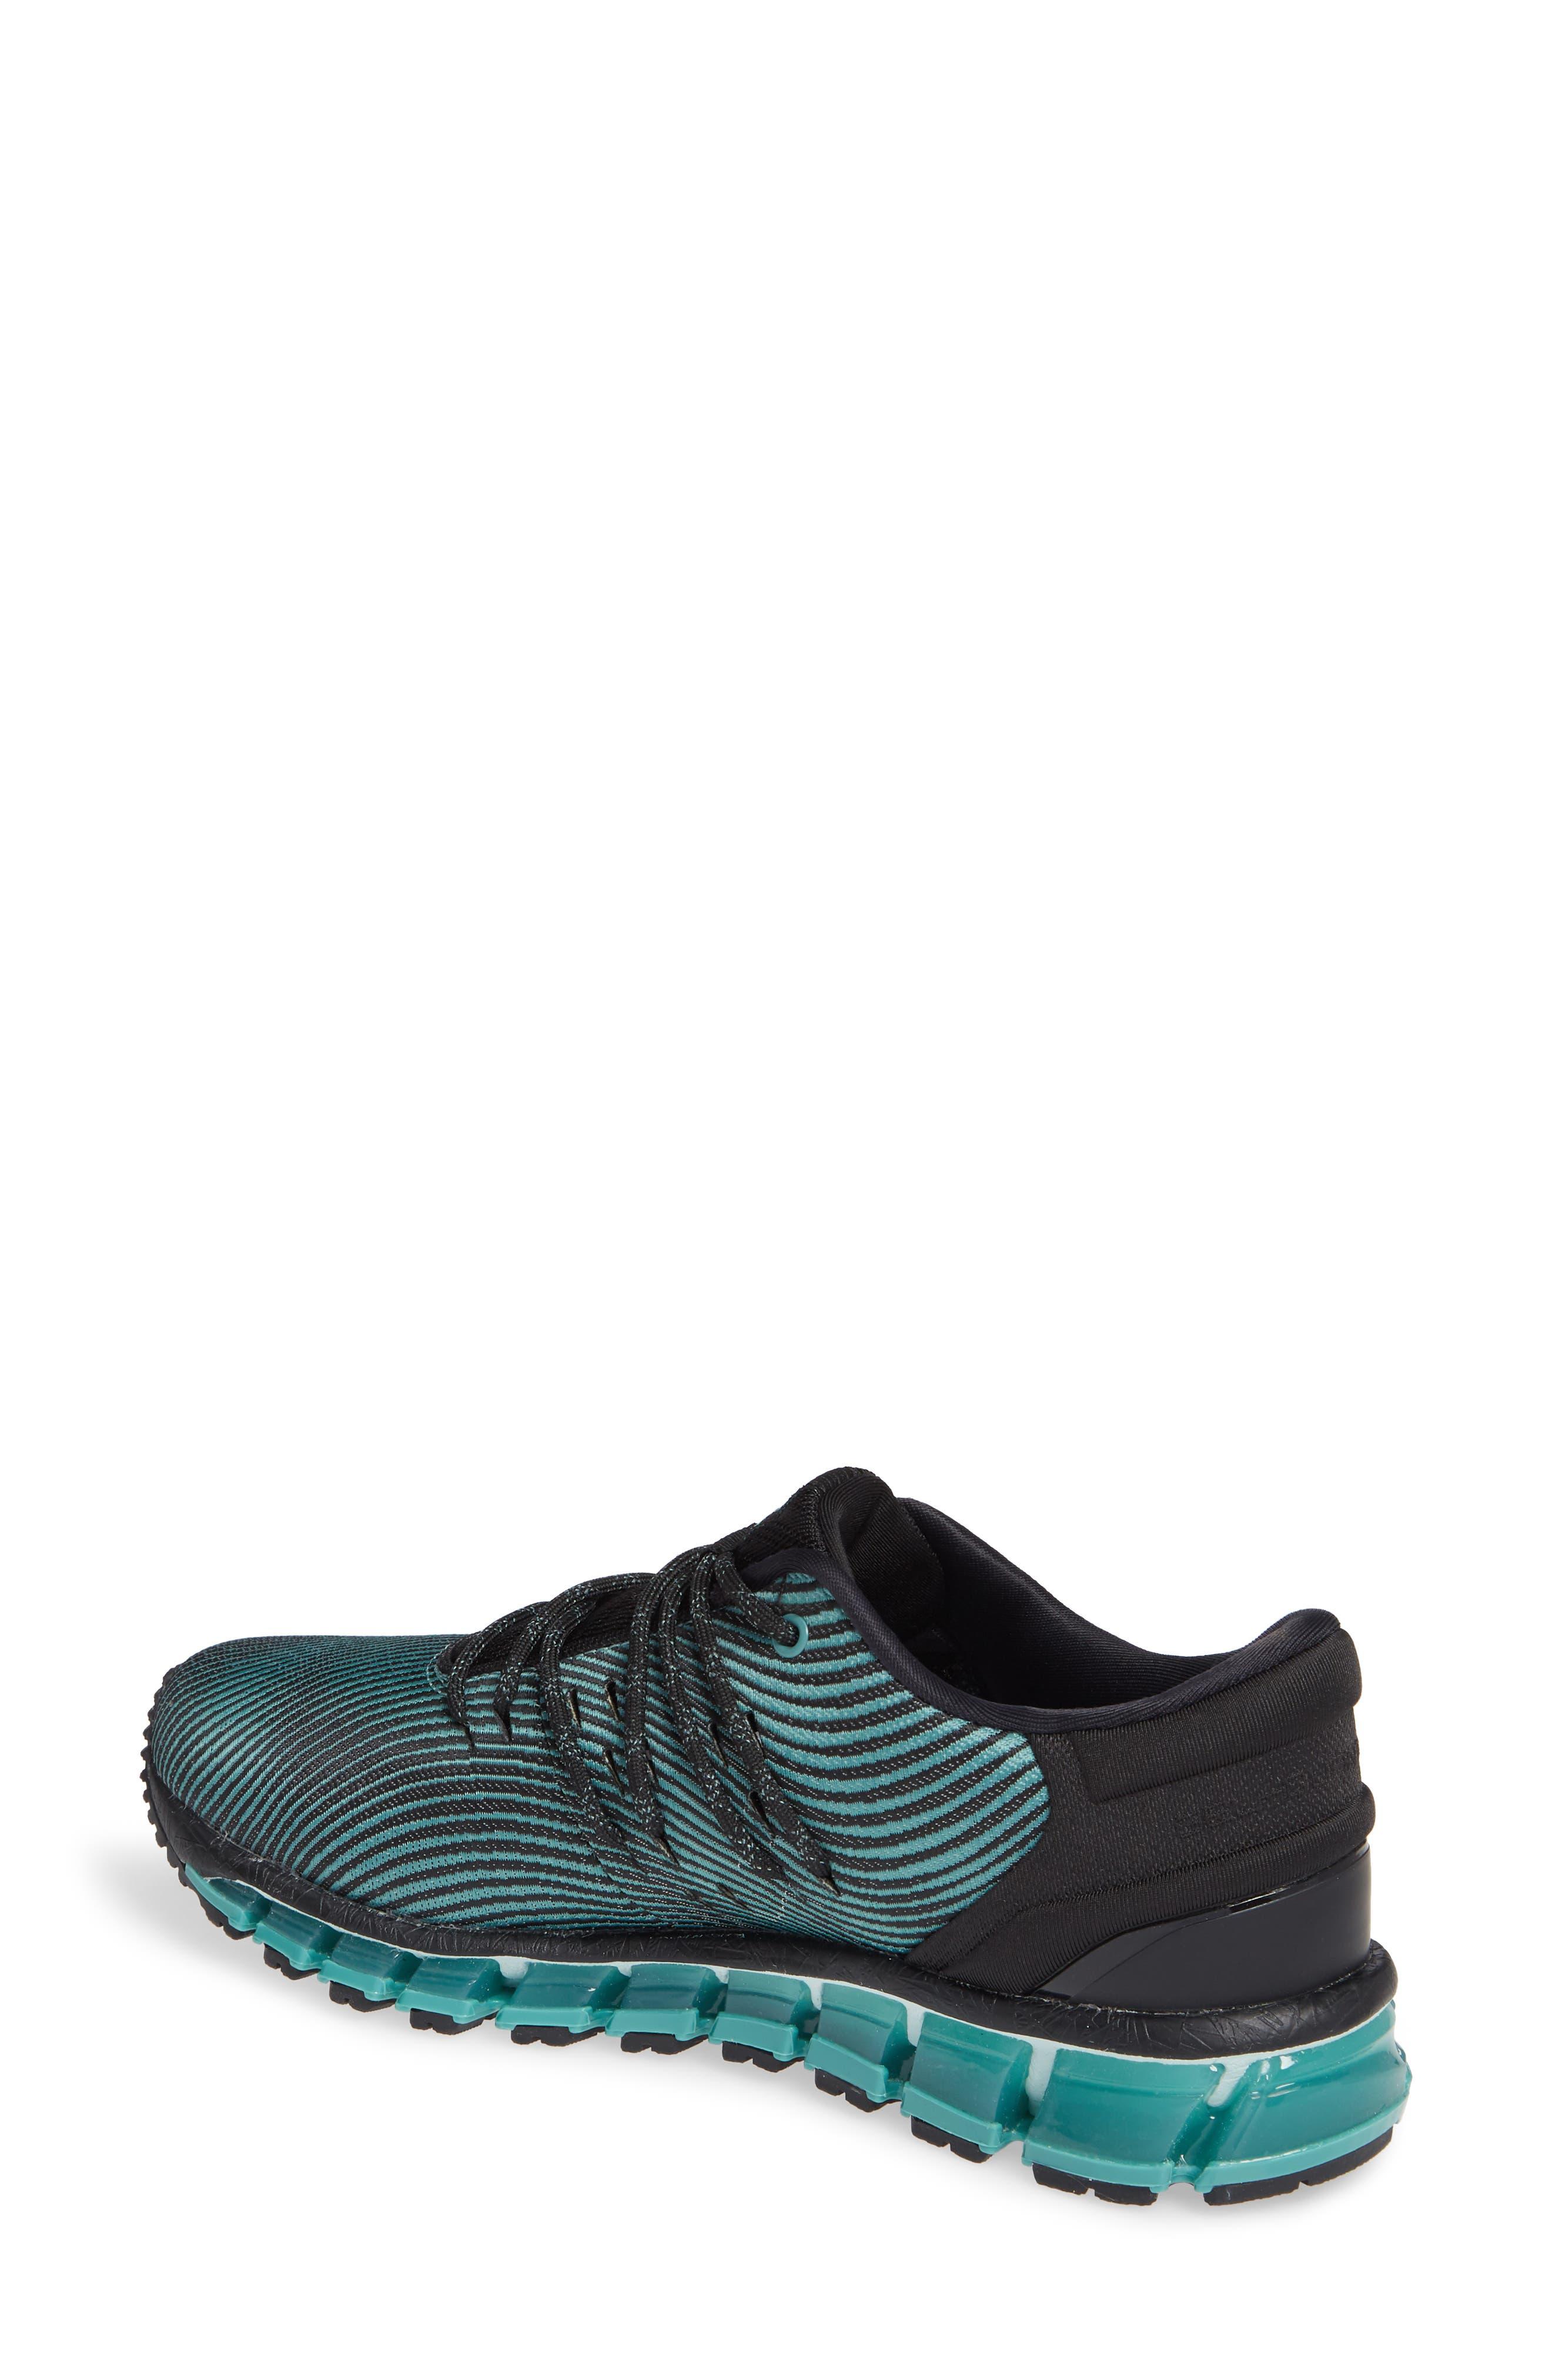 GEL Quantum 360 4 Running Shoe,                             Alternate thumbnail 2, color,                             SAGE/ BLACK